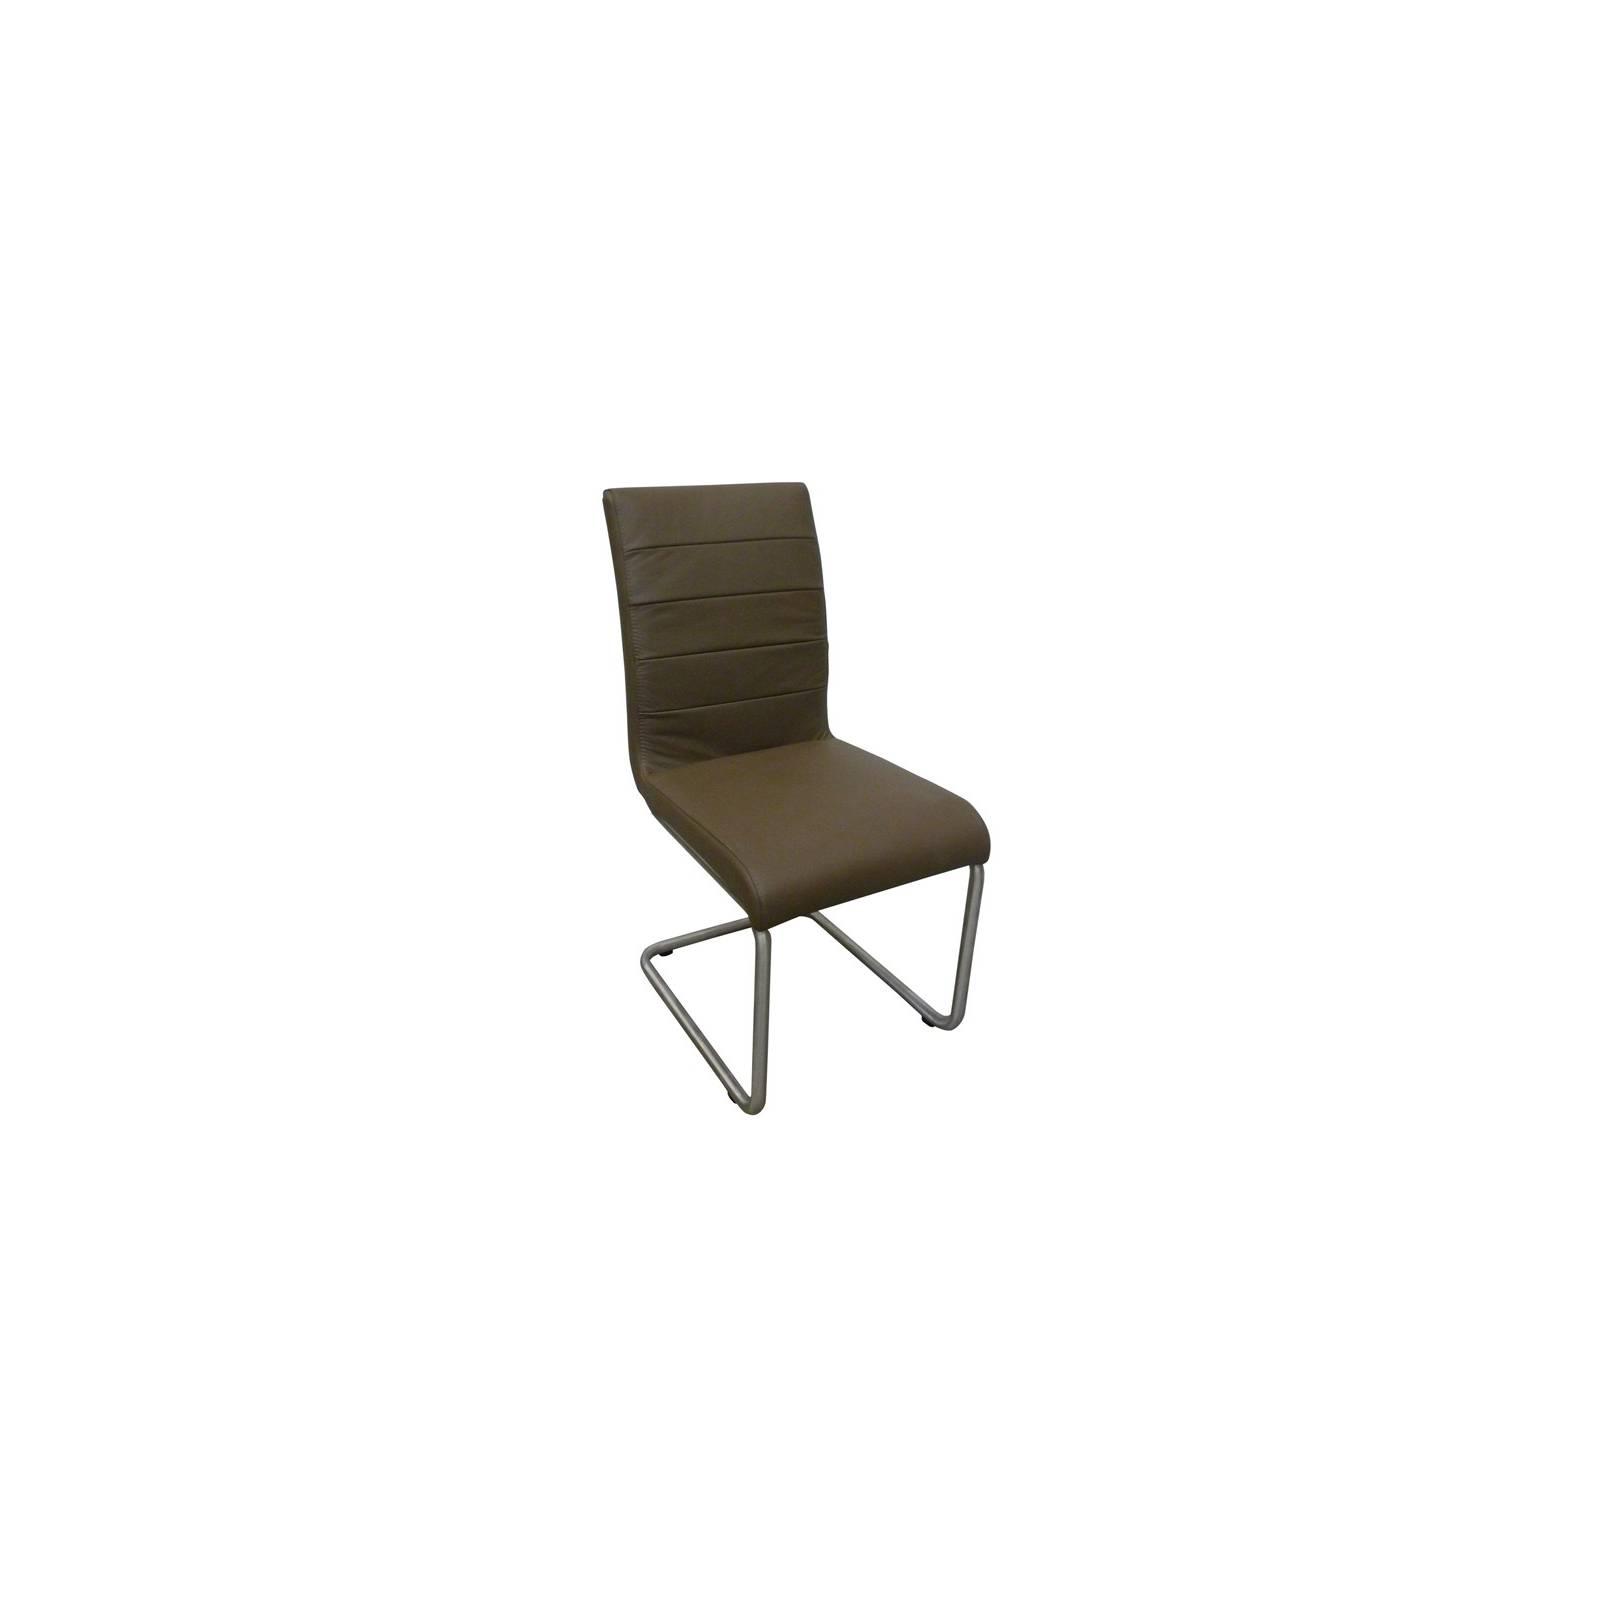 Chaise Lizzy Cuir - chaise design